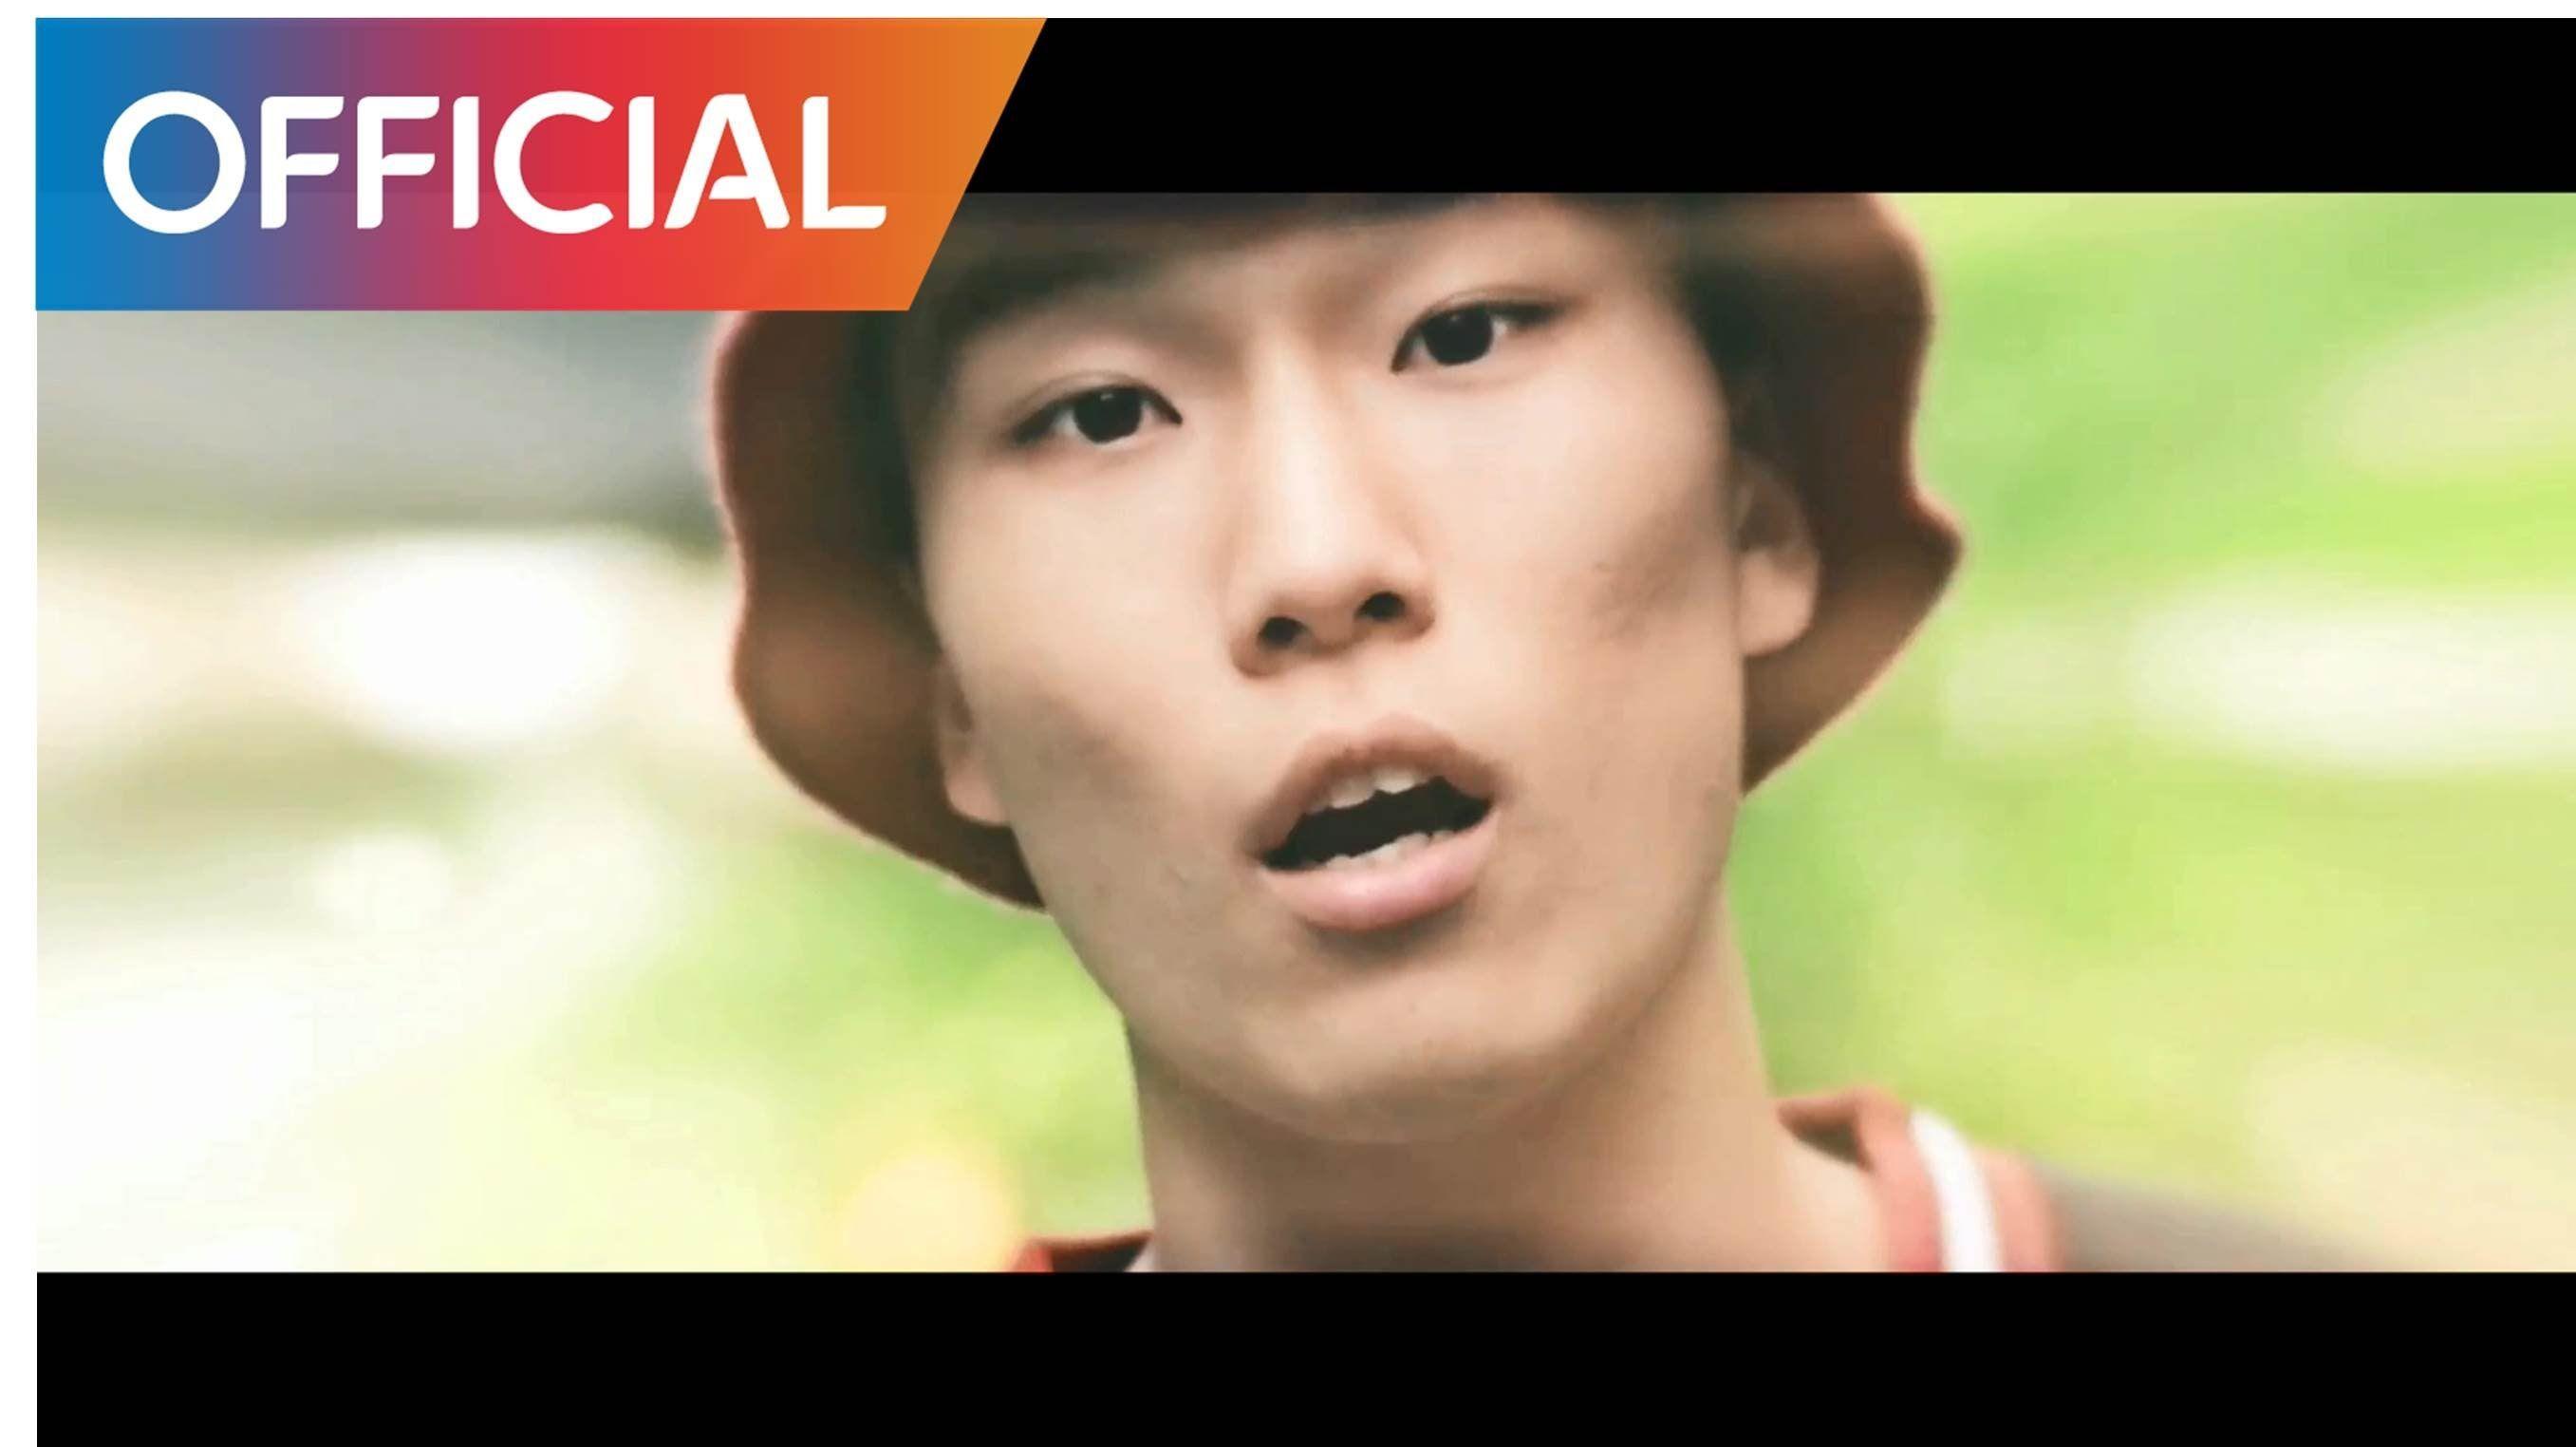 [MV] Coolkids - SeeYa (Feat. Jay Vito)